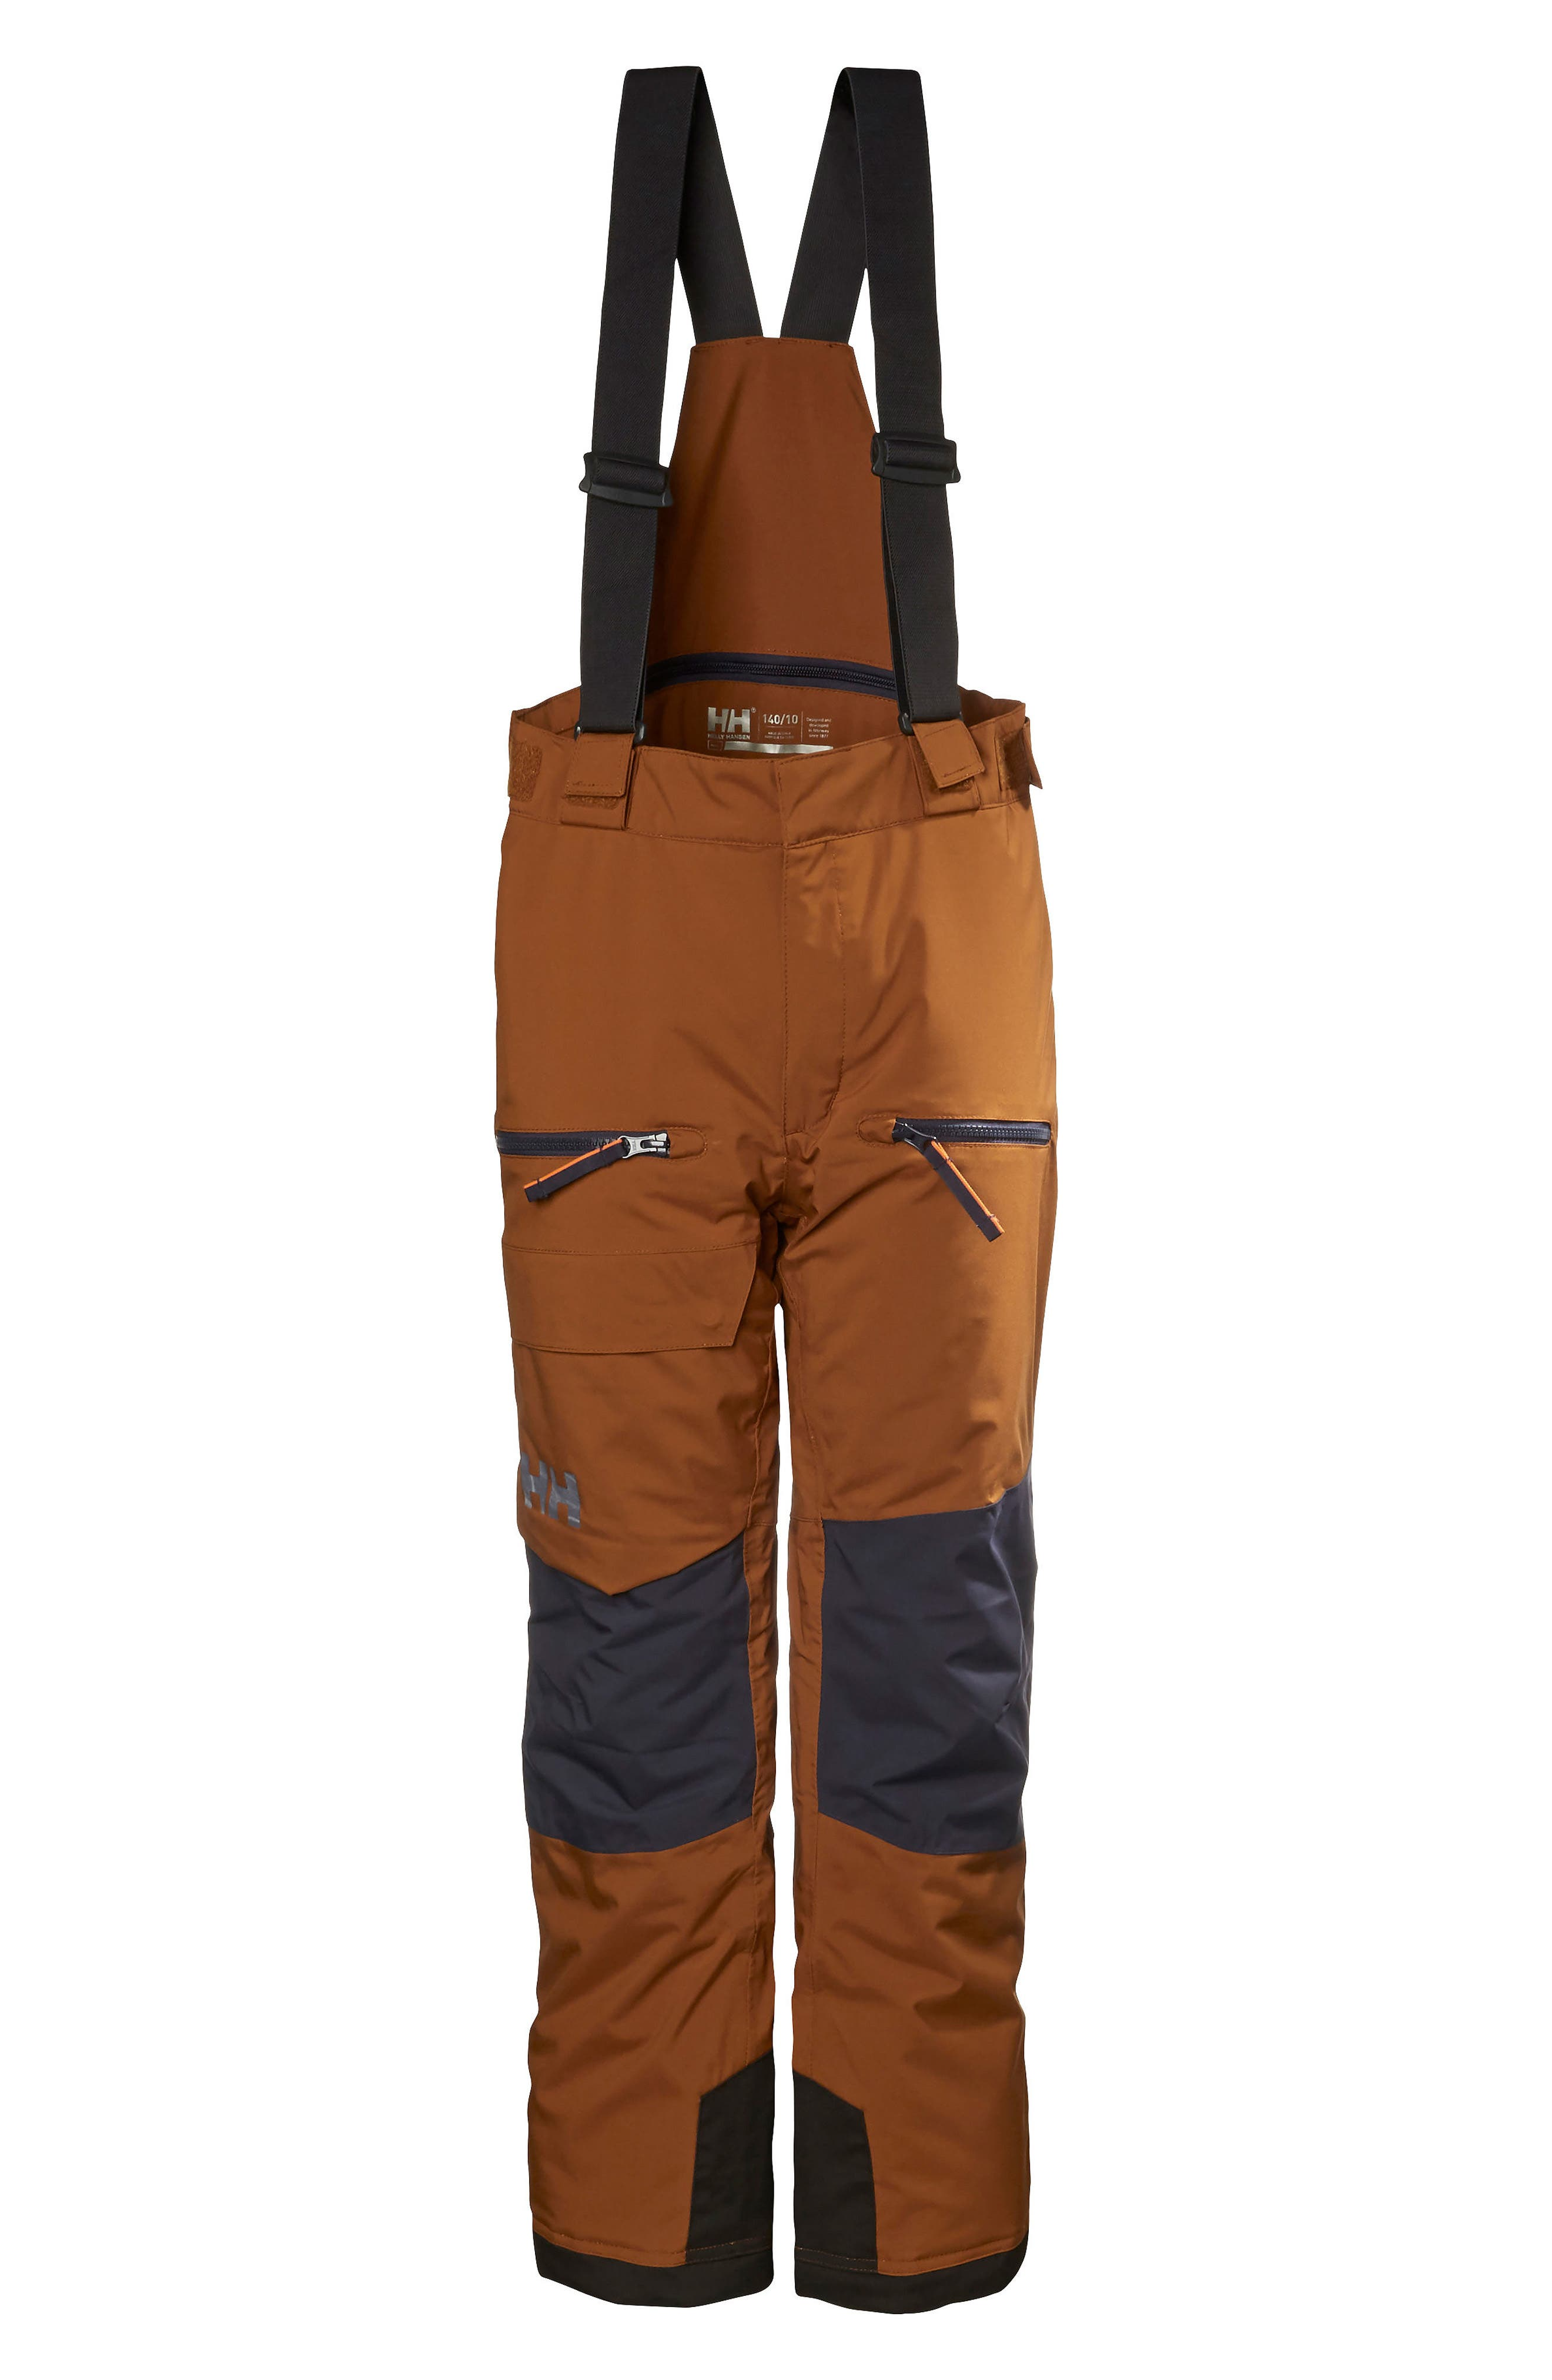 Jr. Powder Waterproof Ski Pants,                             Main thumbnail 1, color,                             201